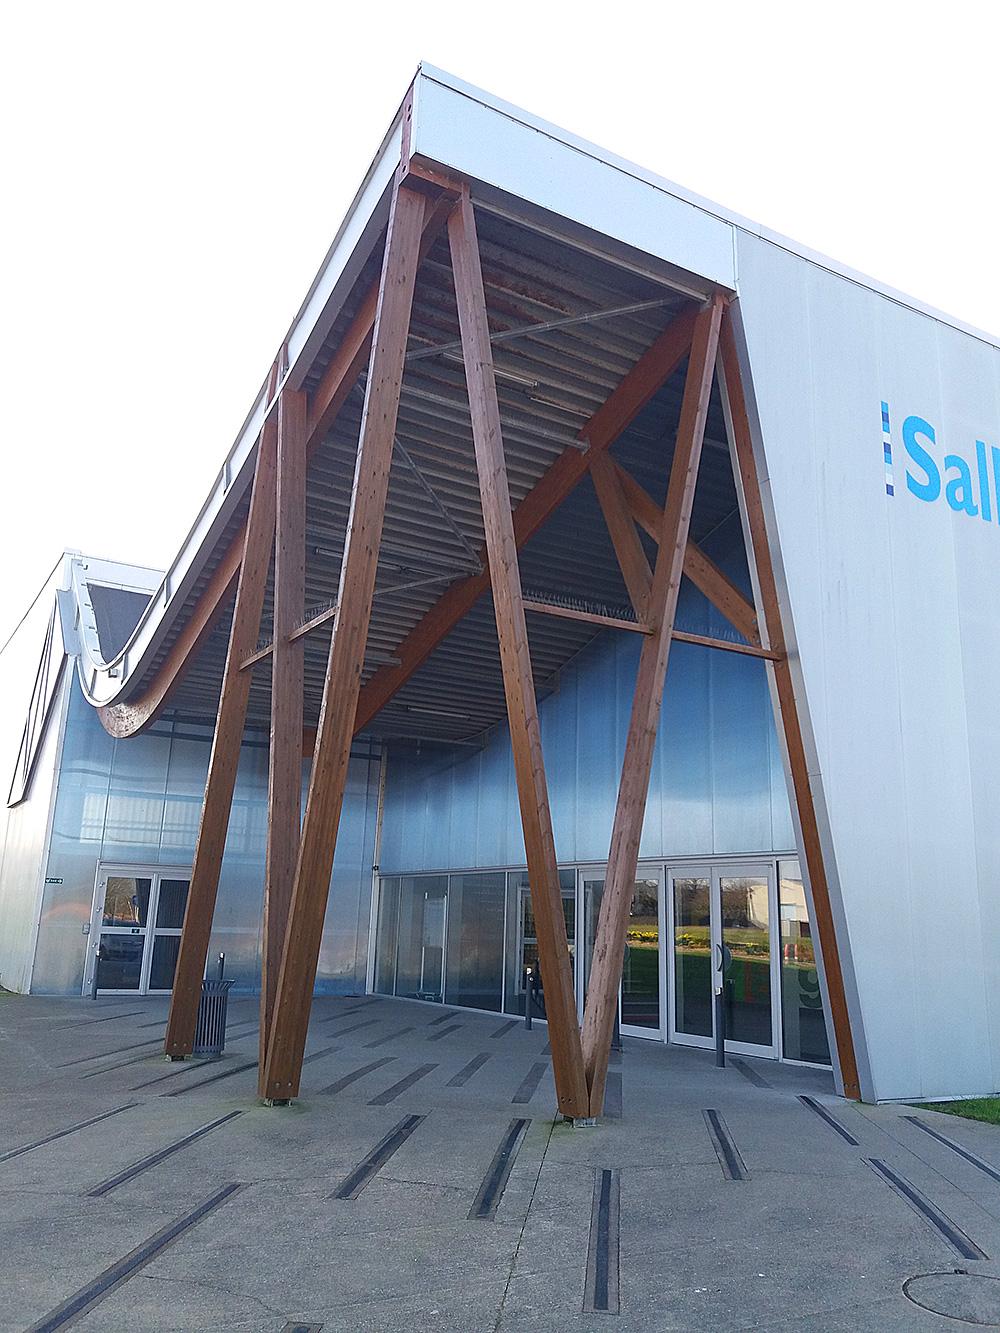 Salle des sports la Guyonniere (85)